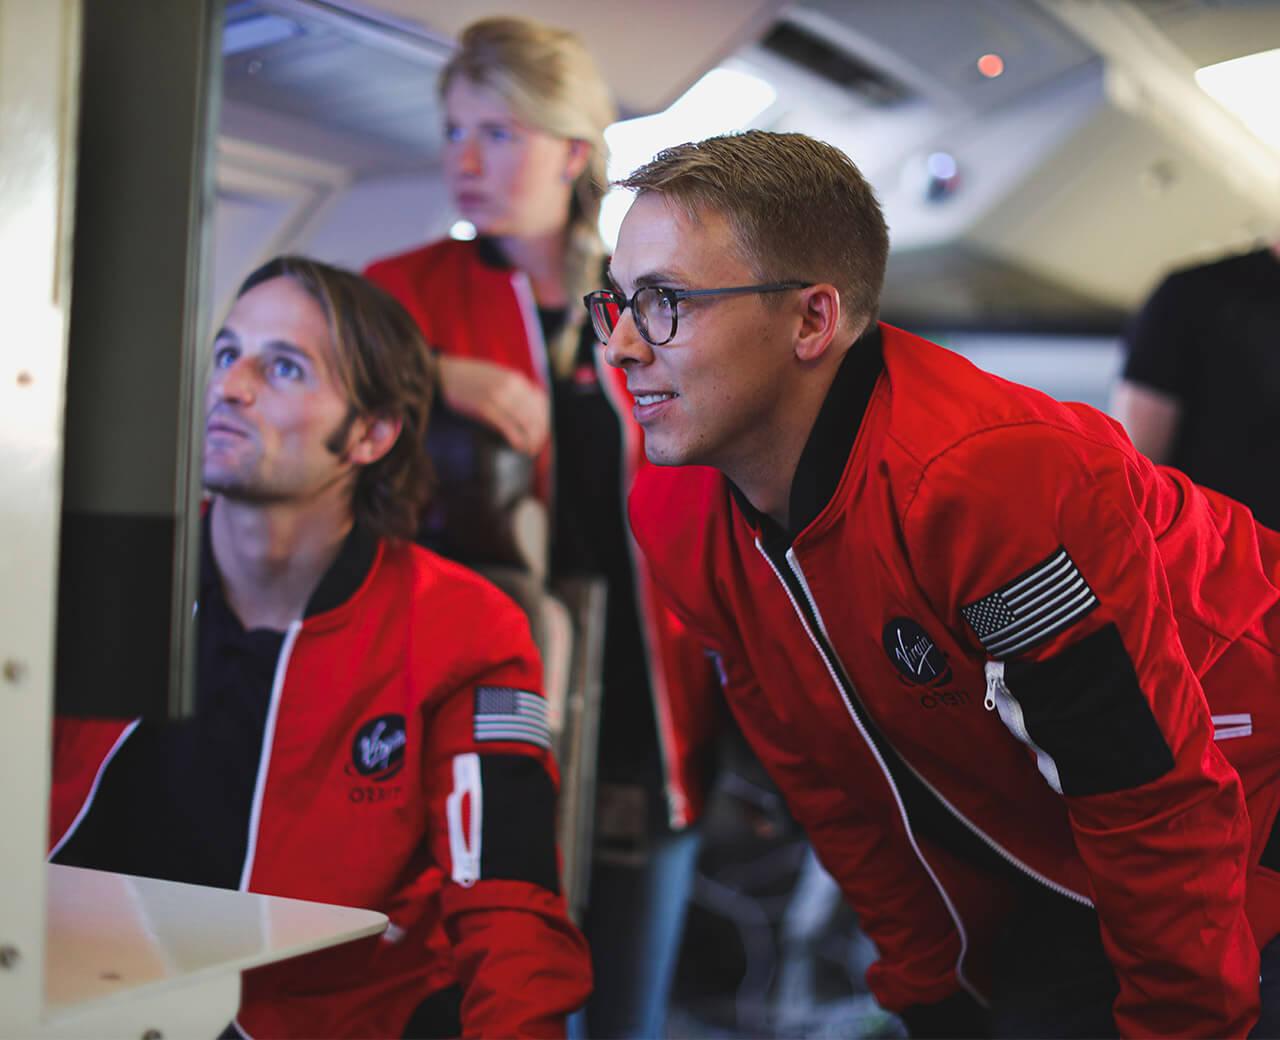 3 Virgin Orbit scientists looking at a computer screen